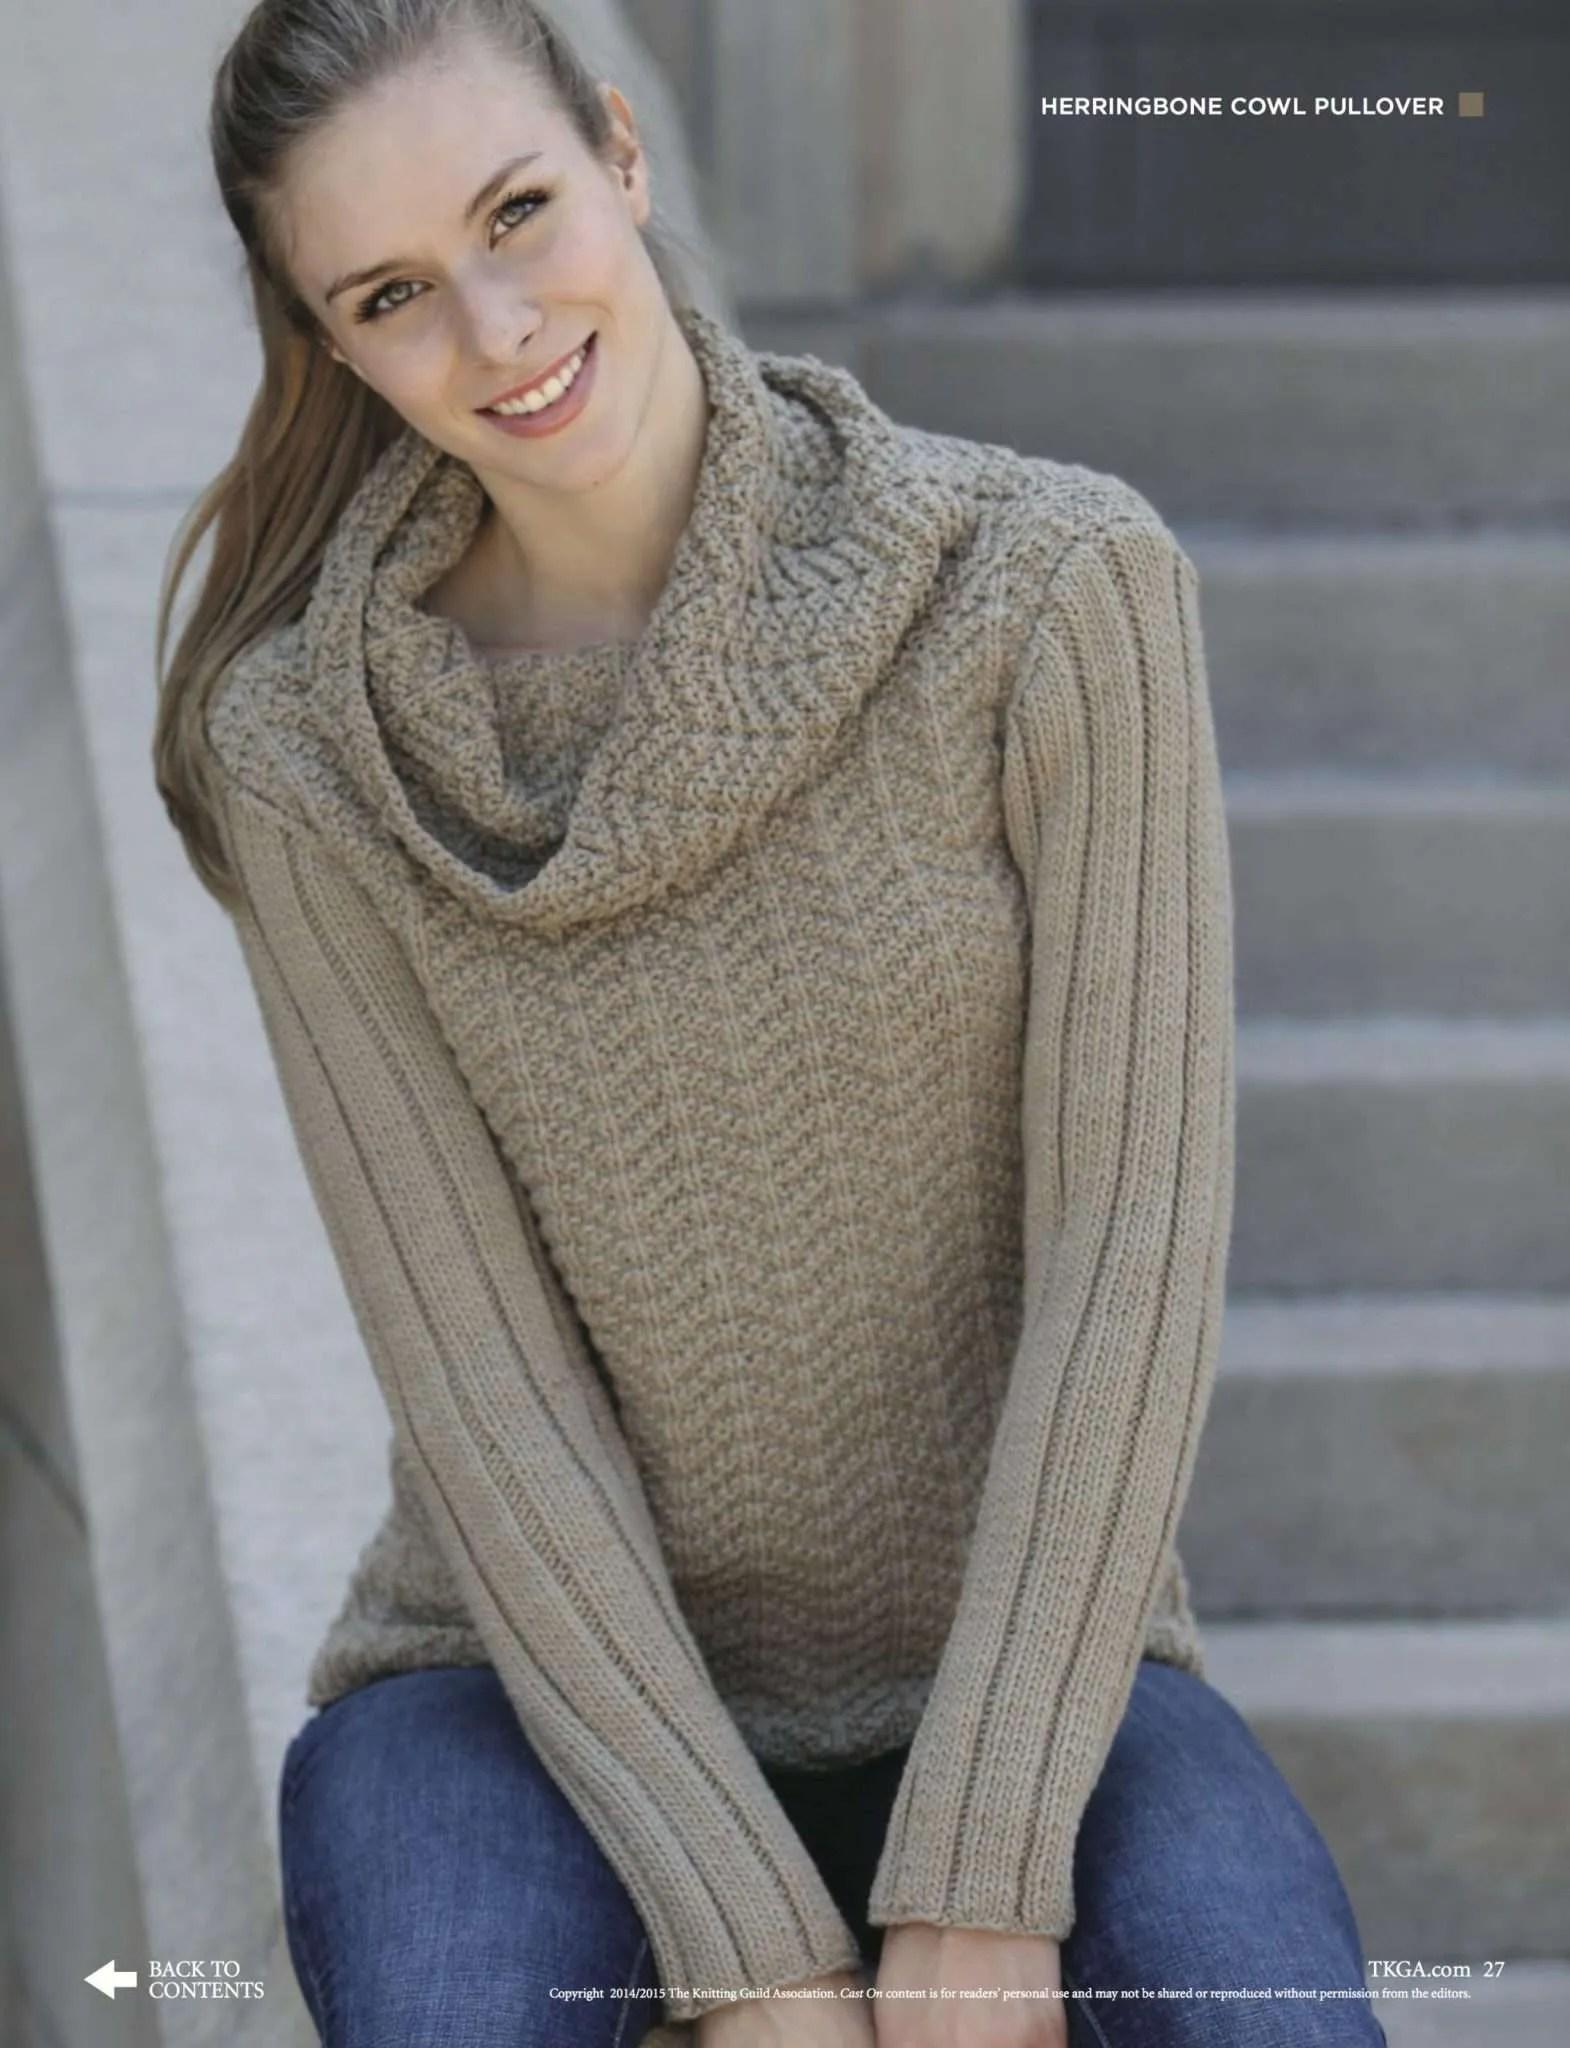 Herringbone Cowl Pullover